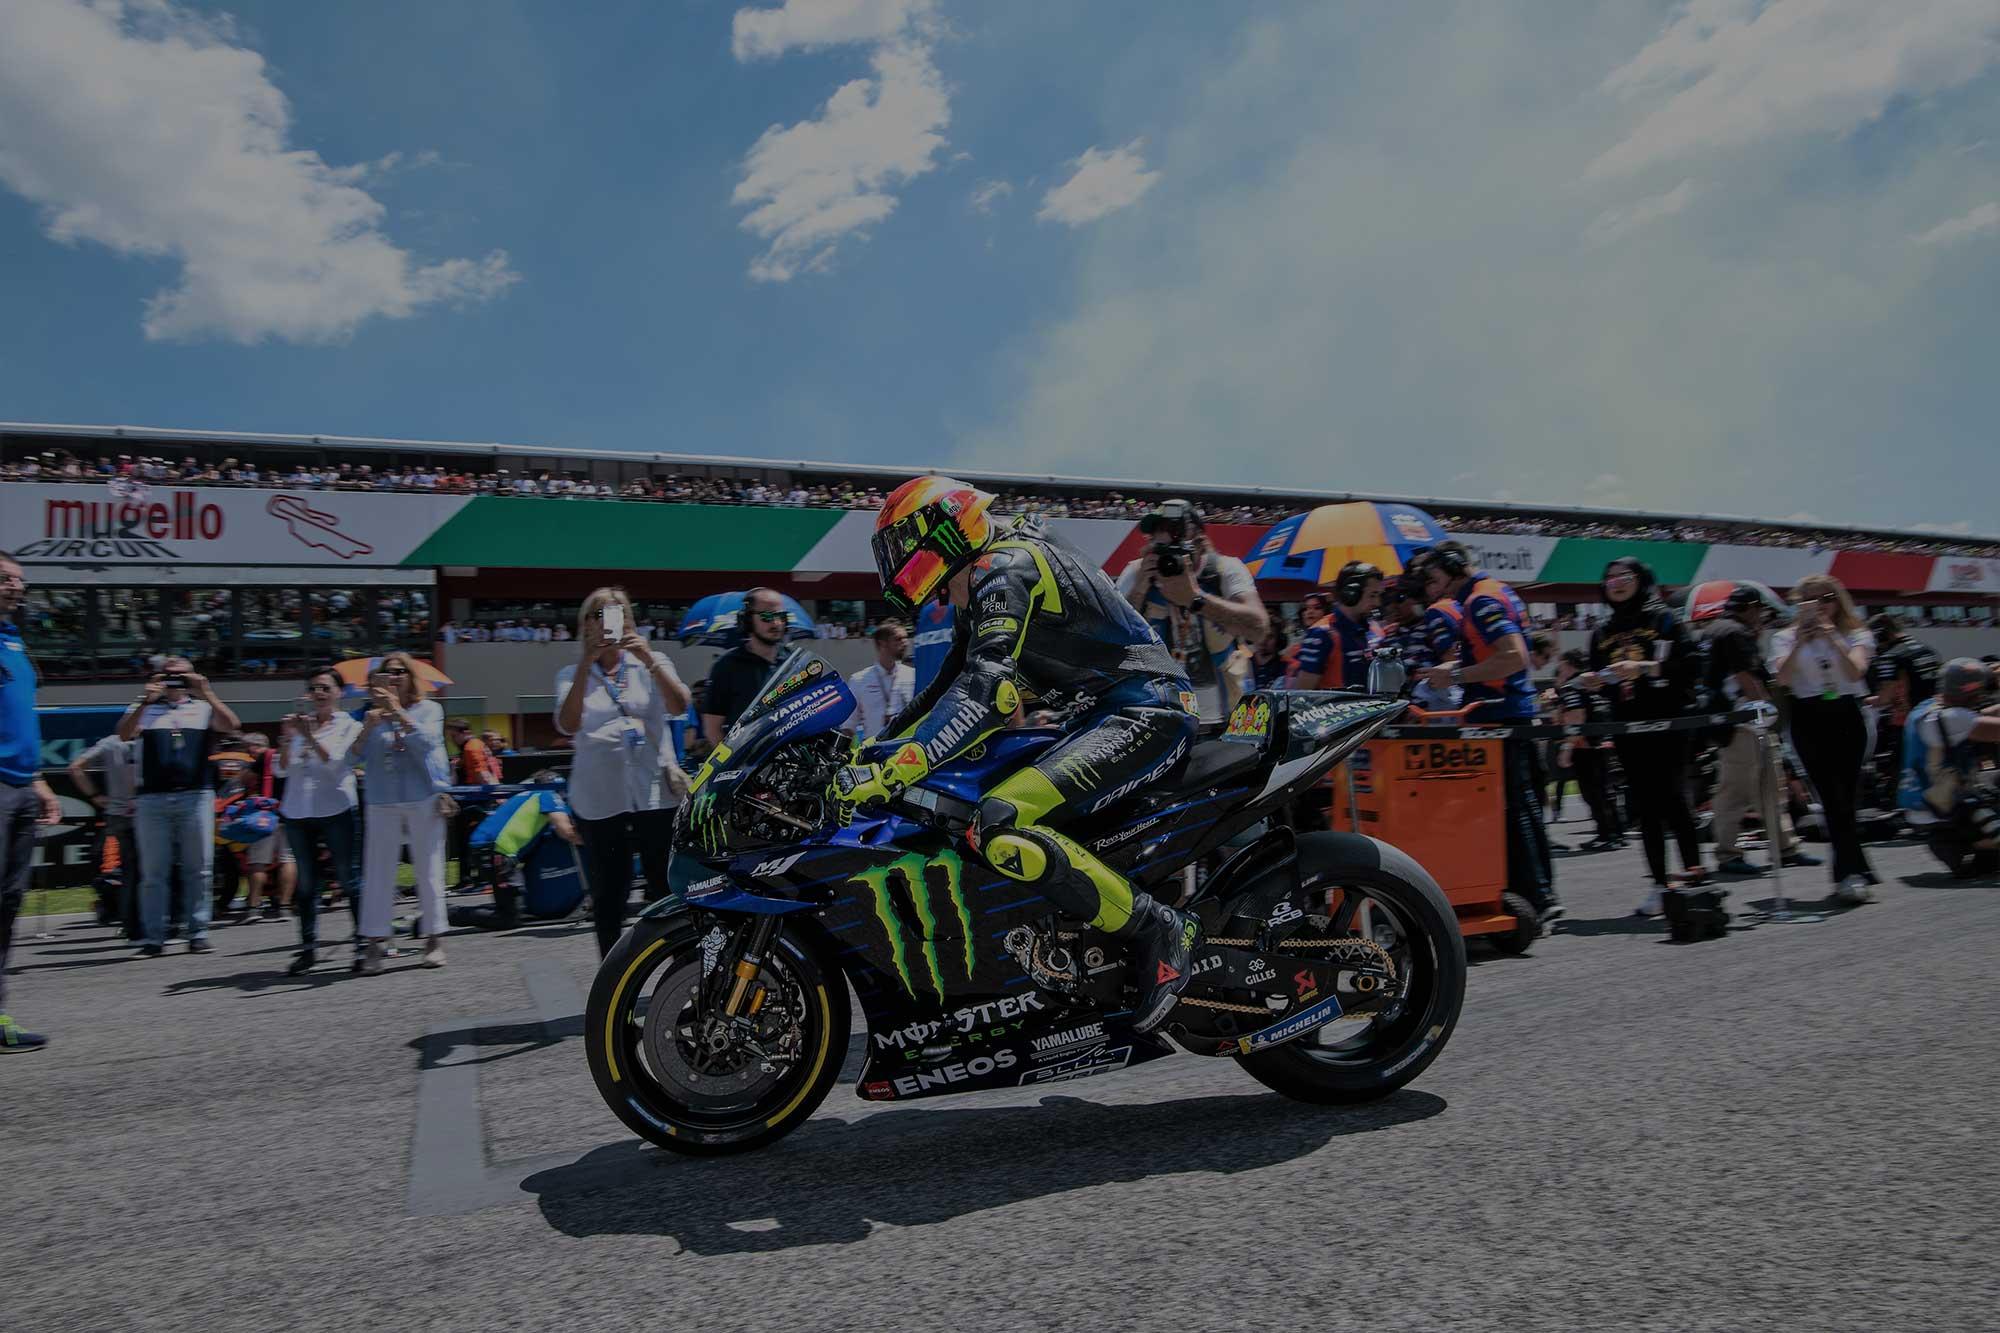 2021 MotoGP Travel packages